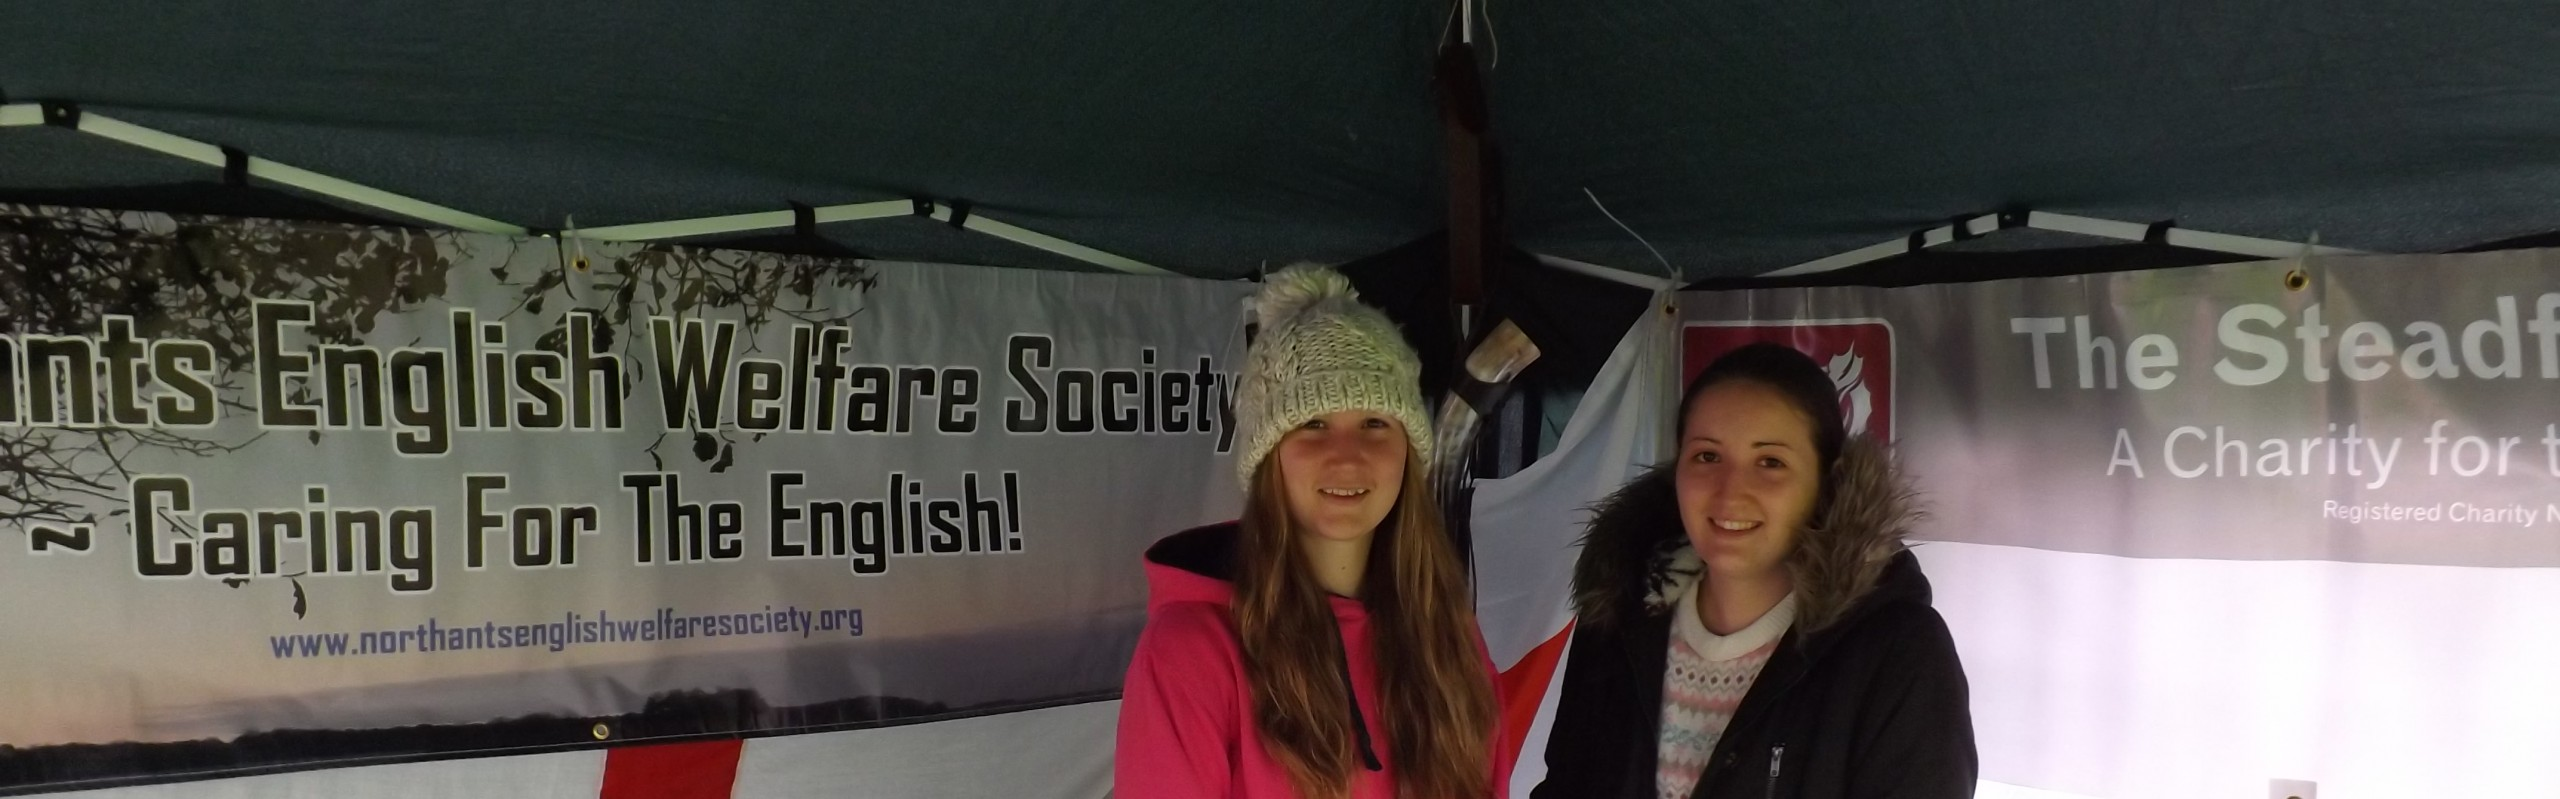 Northants English Welfare Society